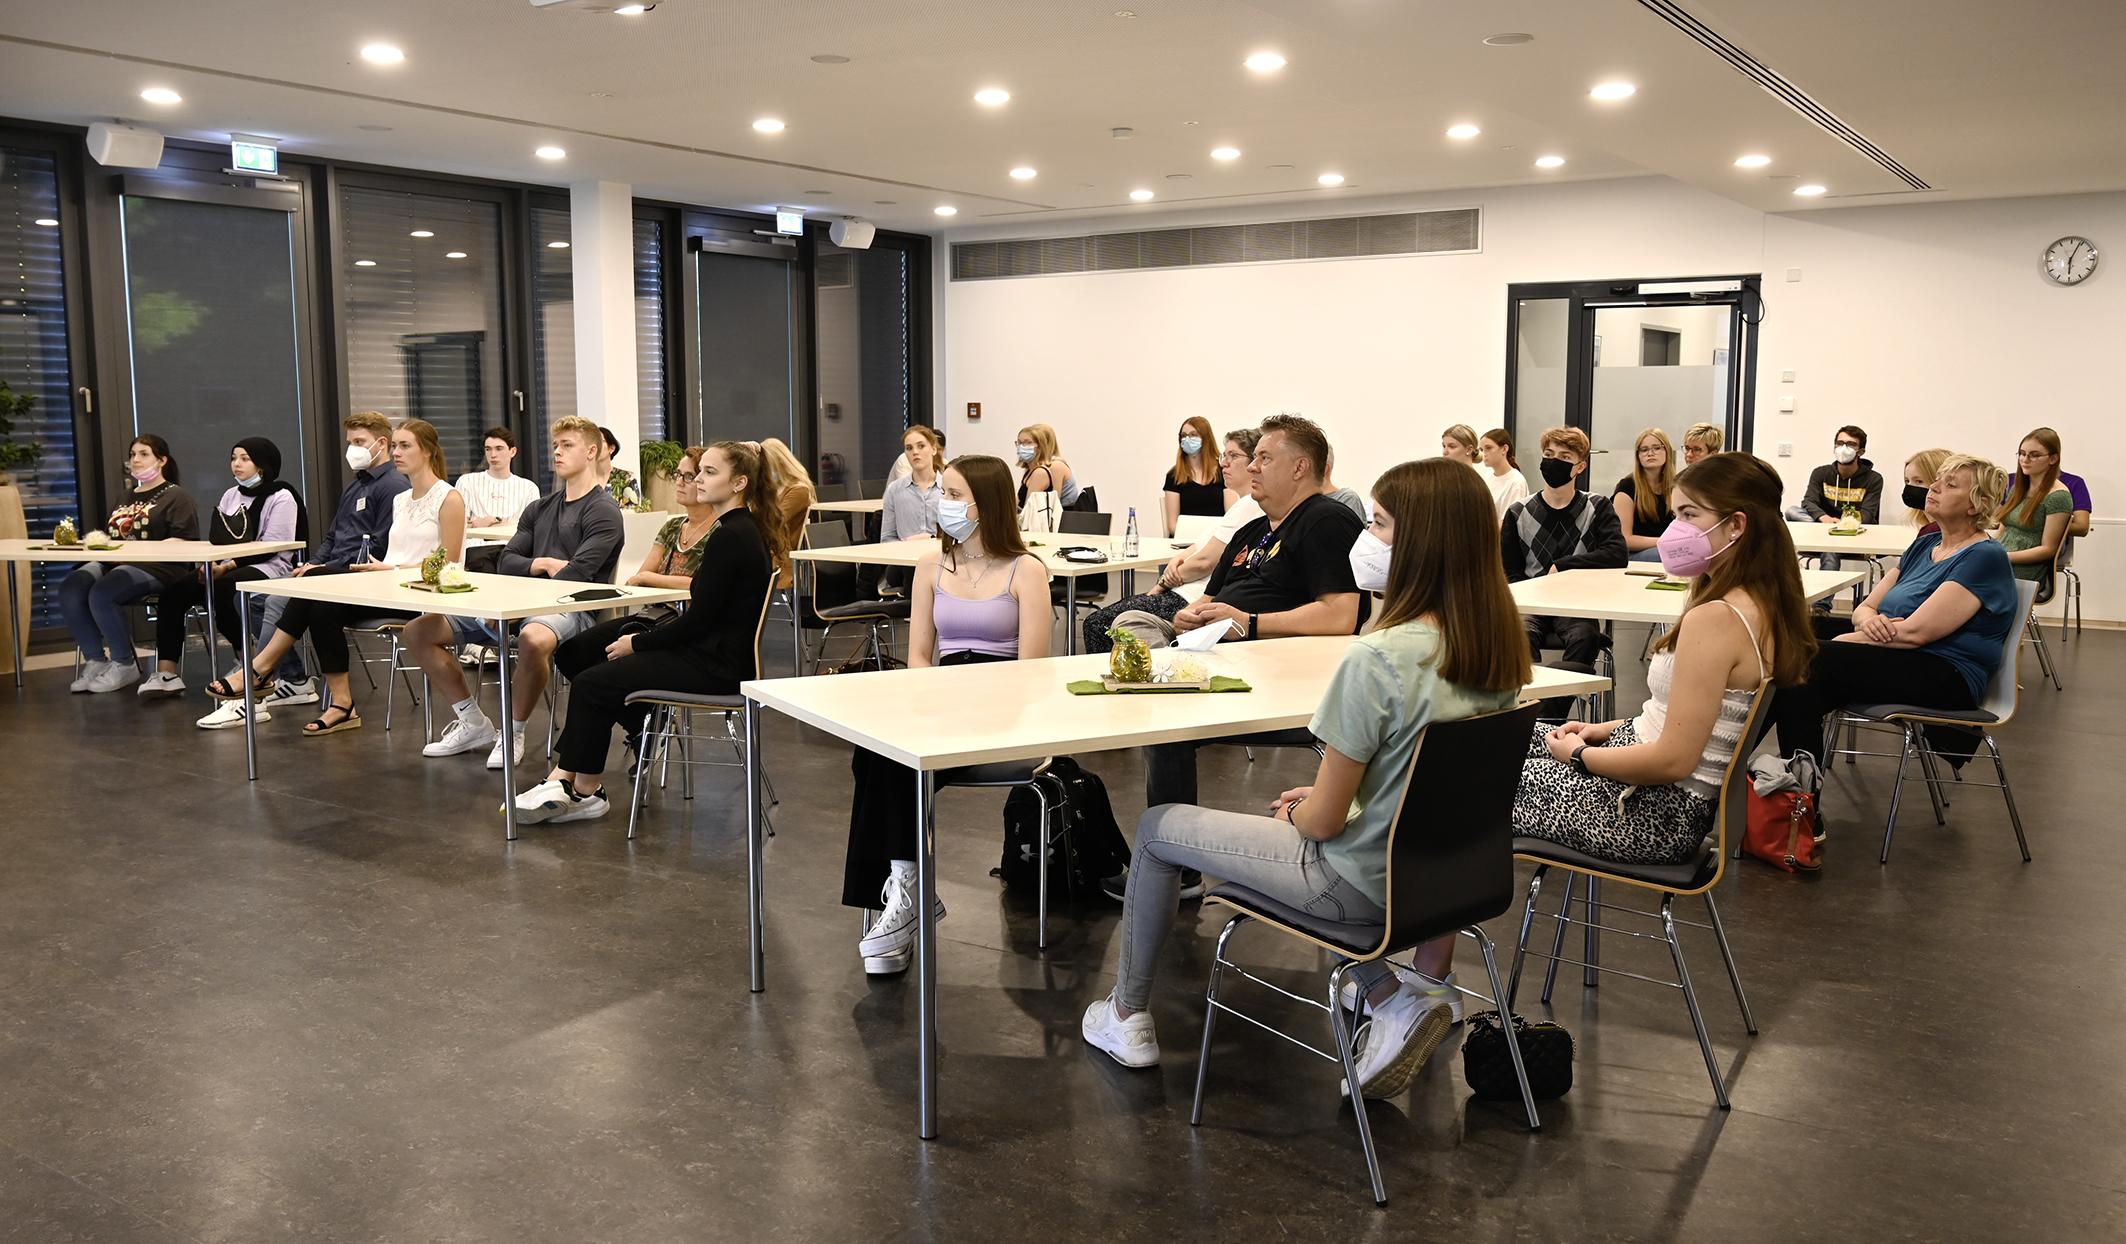 Ausbildung   Kreis Steinfurt